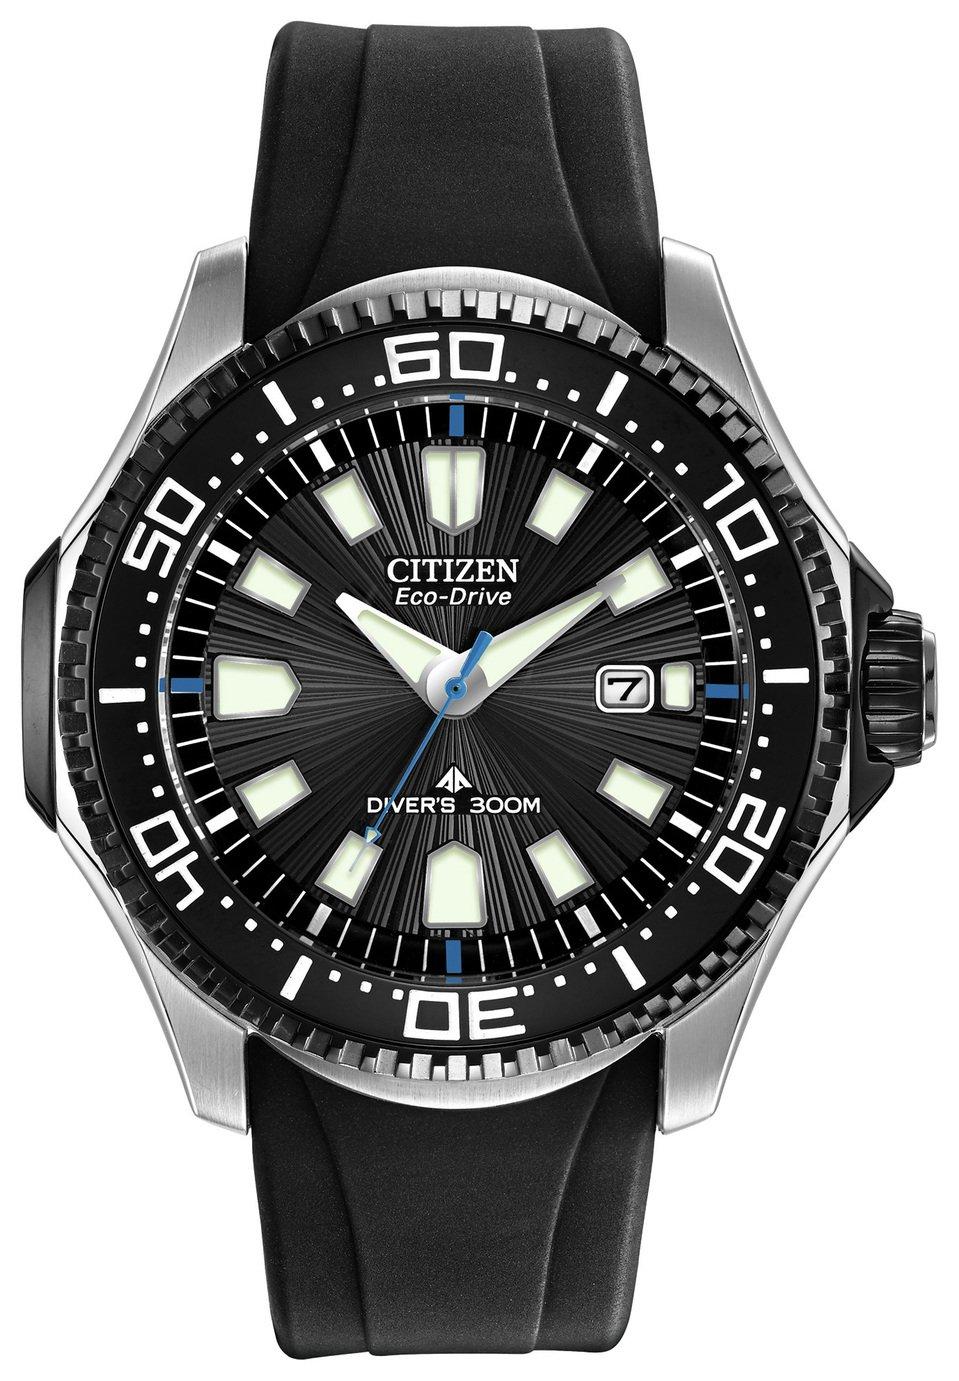 Citizen Eco-Drive Men's Black Silicone Rotating Bezel Watch